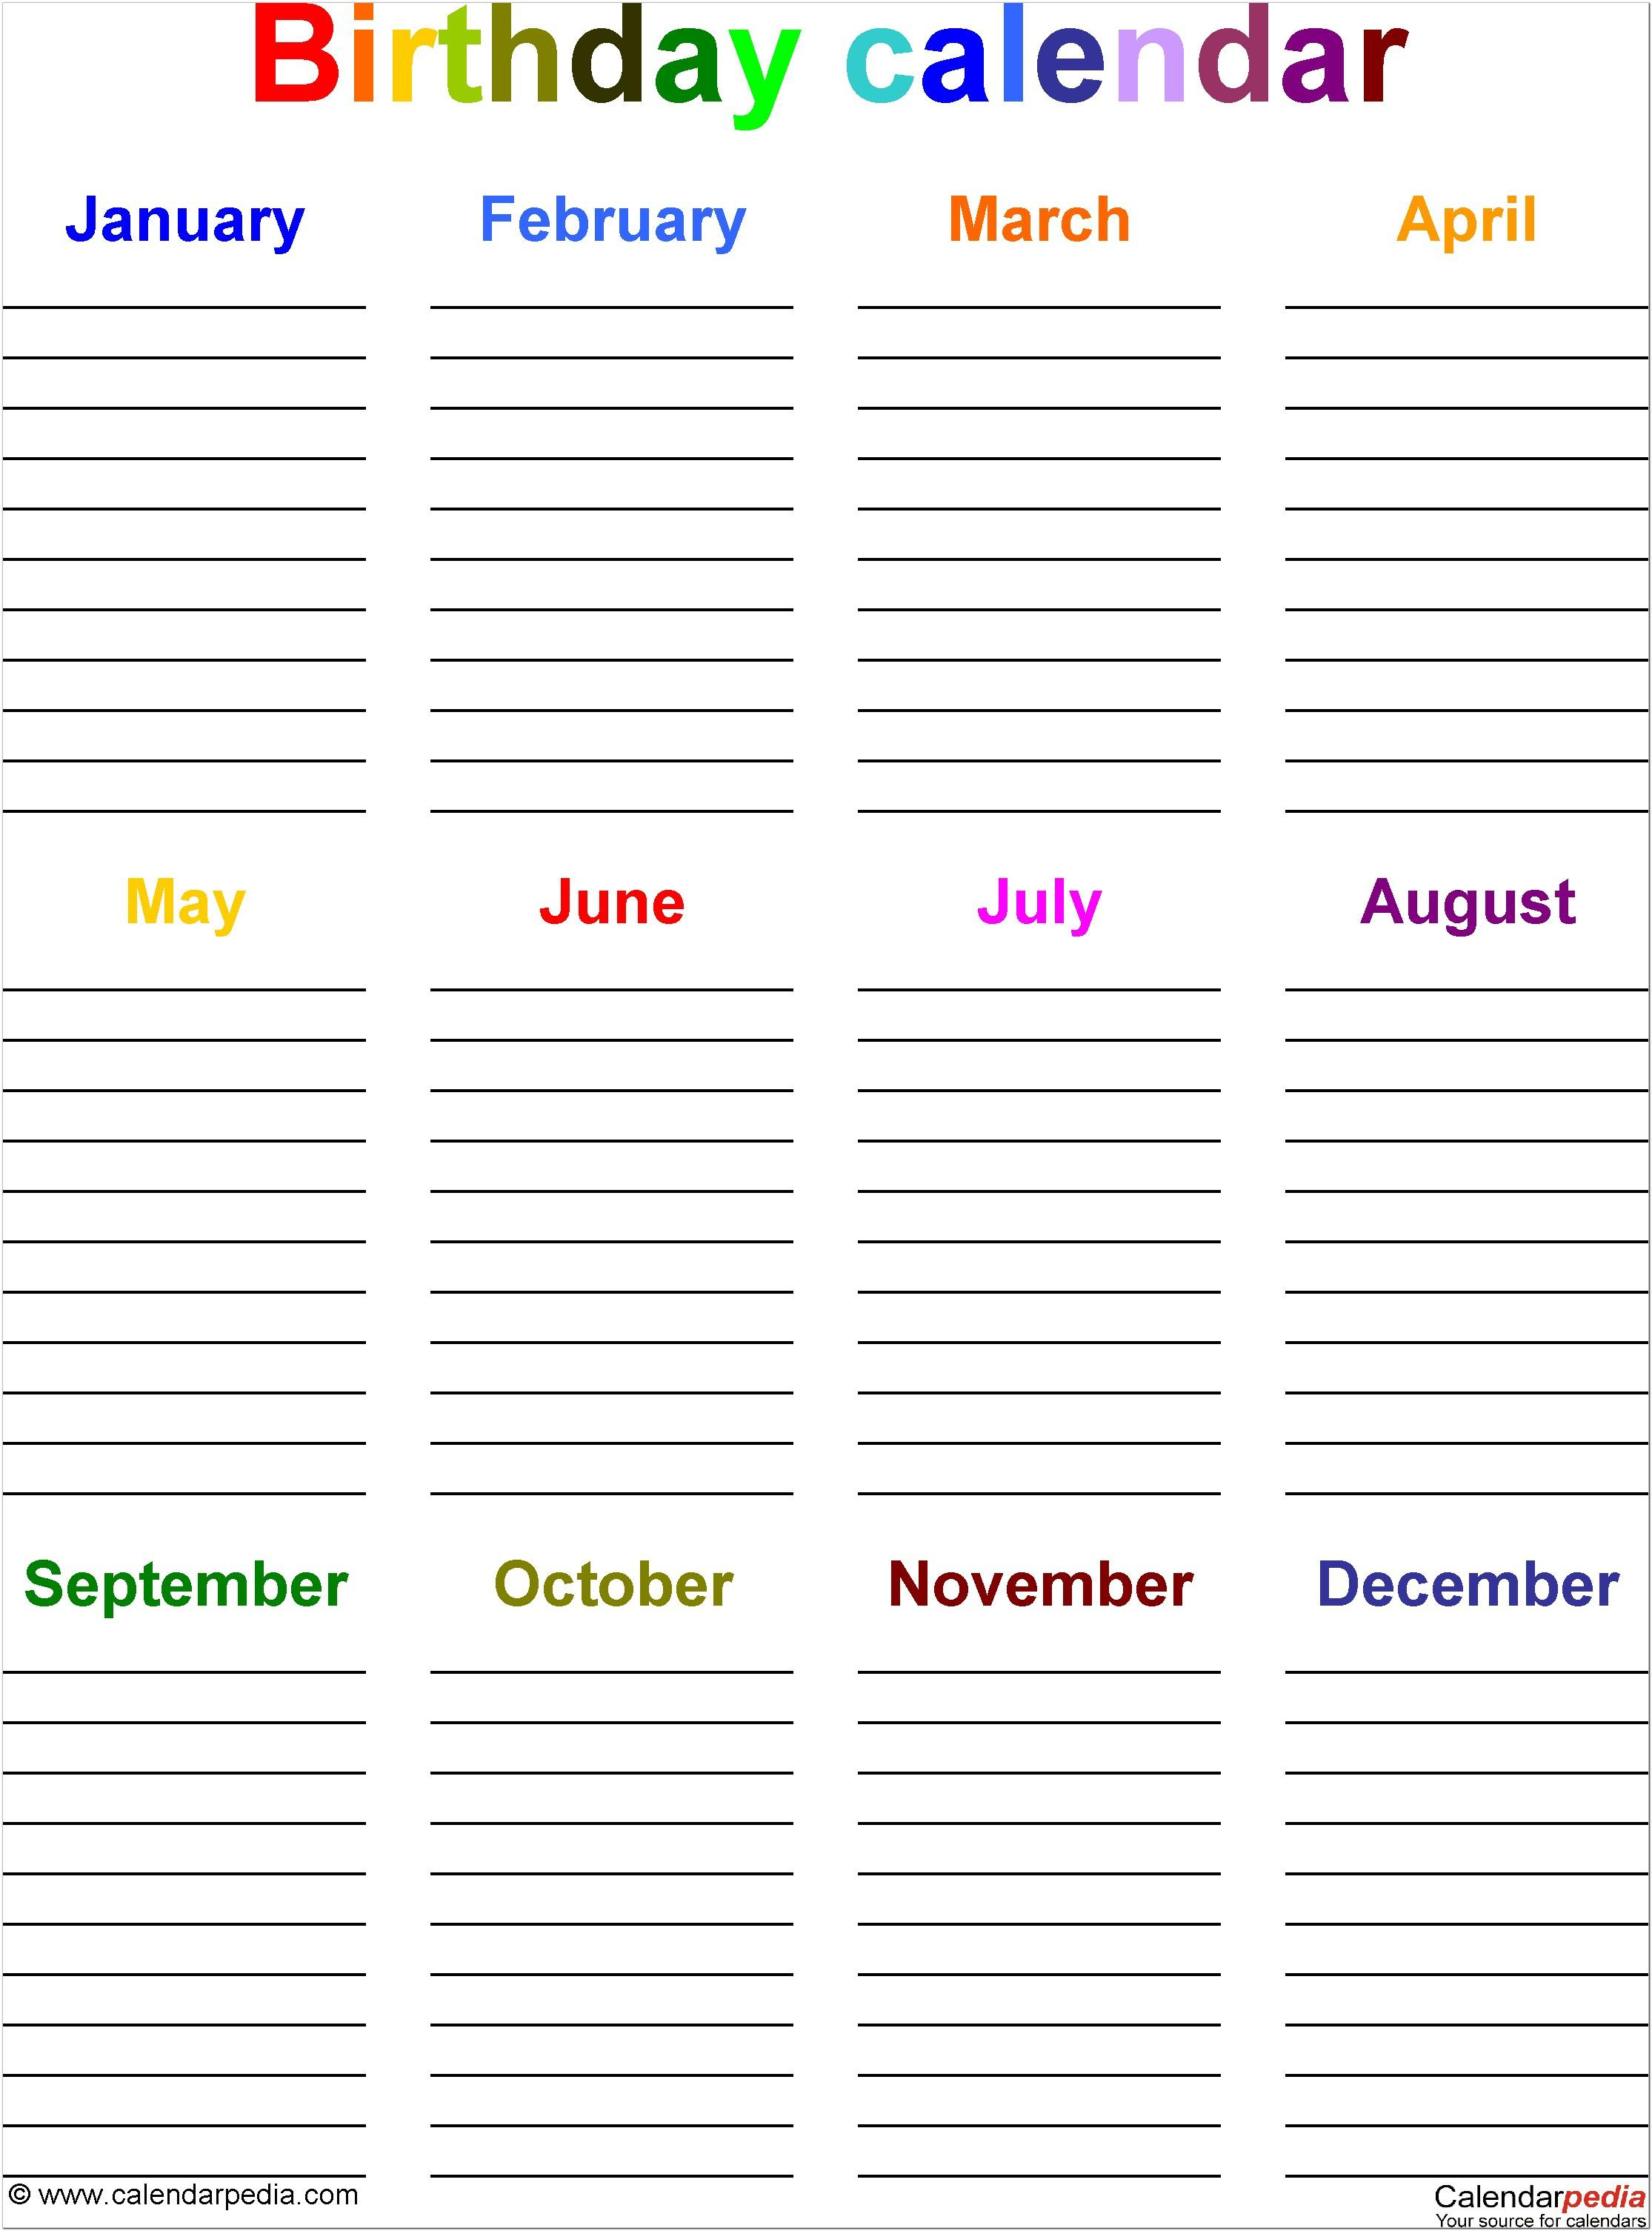 1St Birthday Printable Invitations Free  Template Designs regarding Blank Birthday Calendar Template